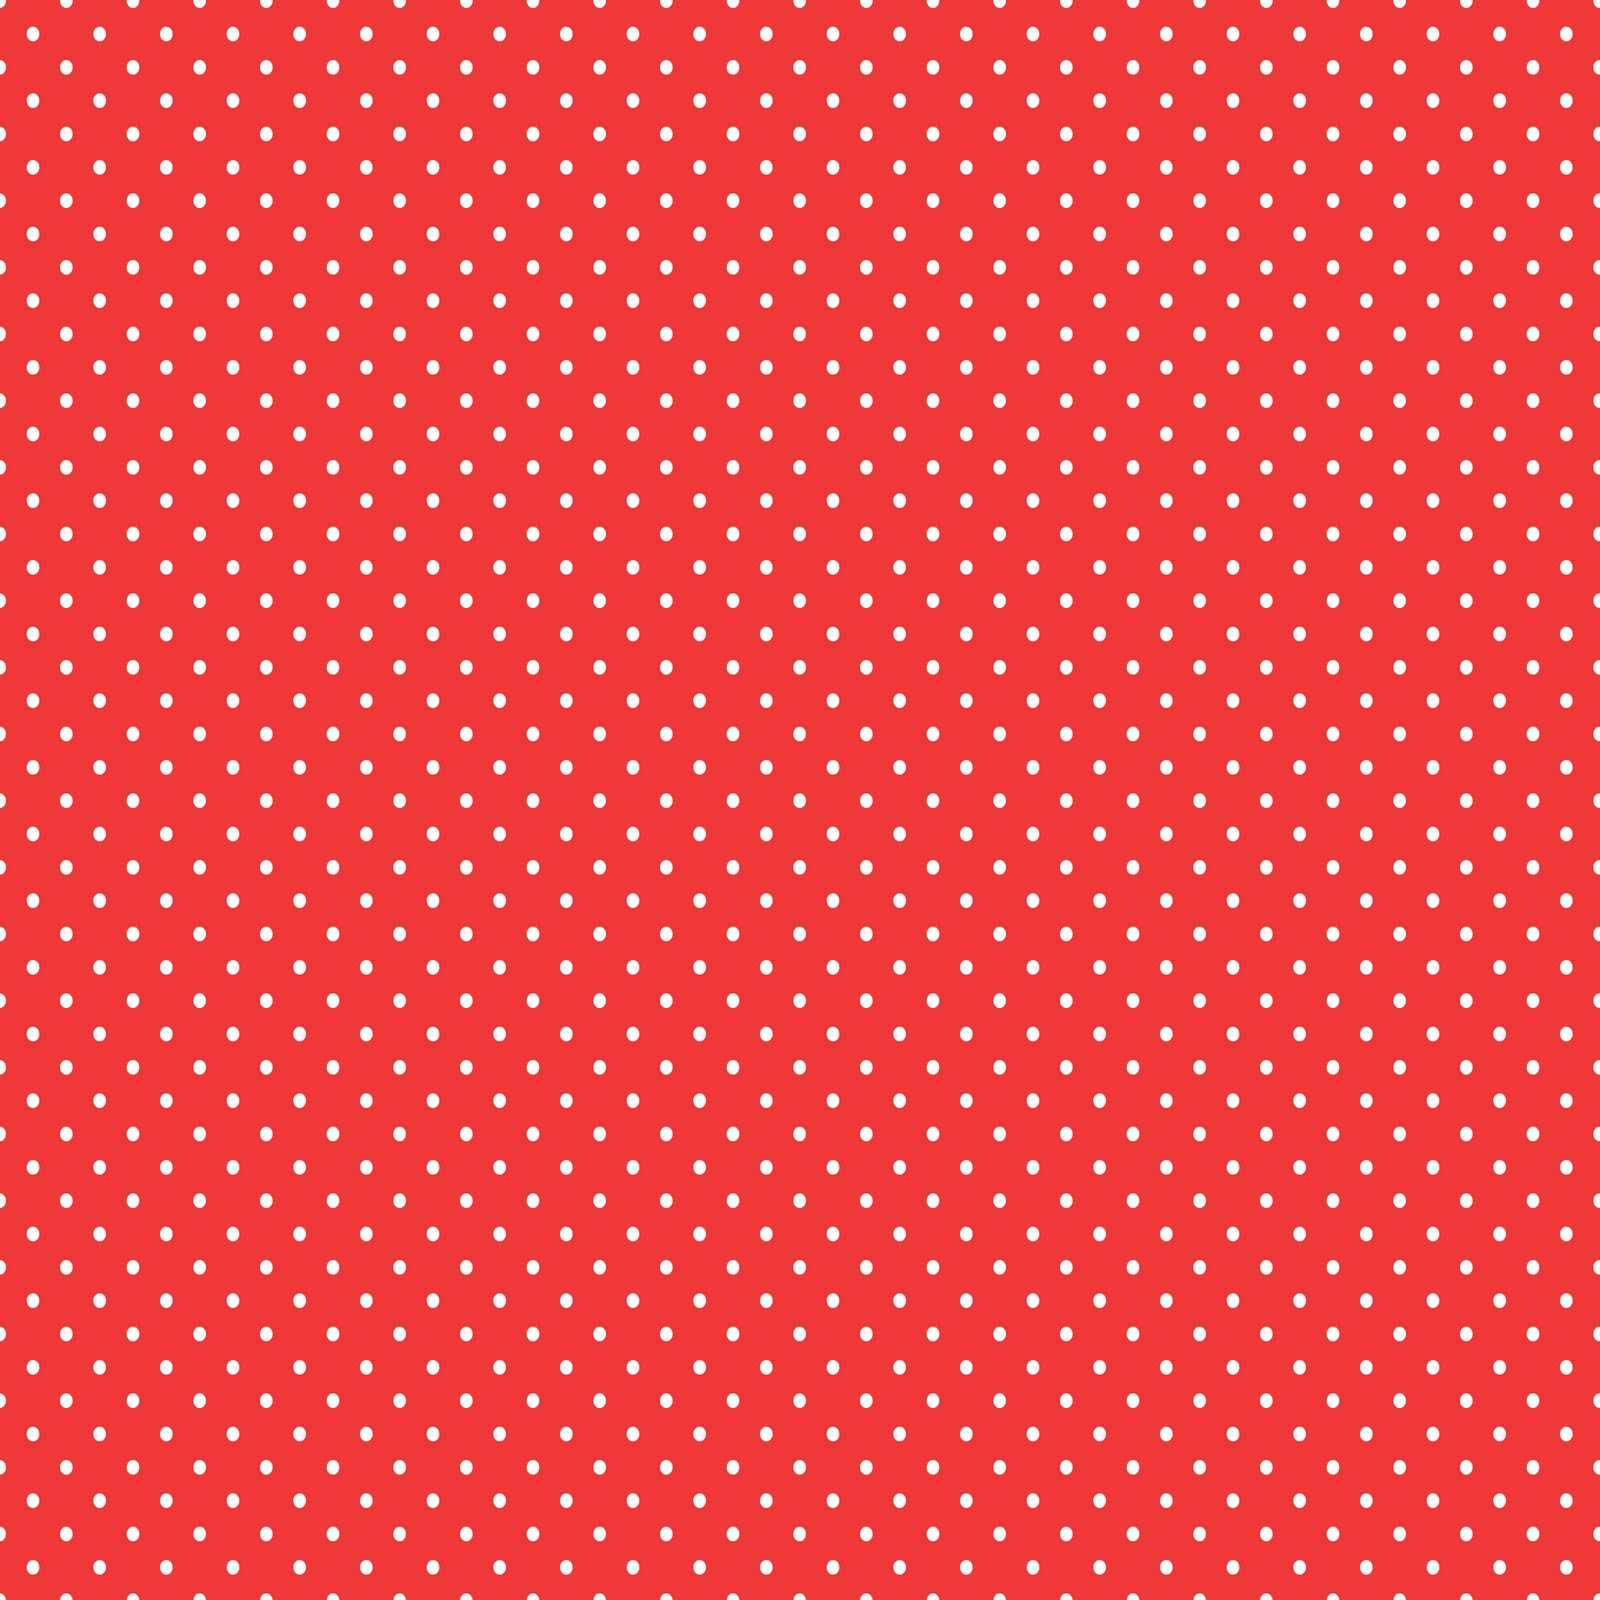 red white dots wallpaper - photo #24